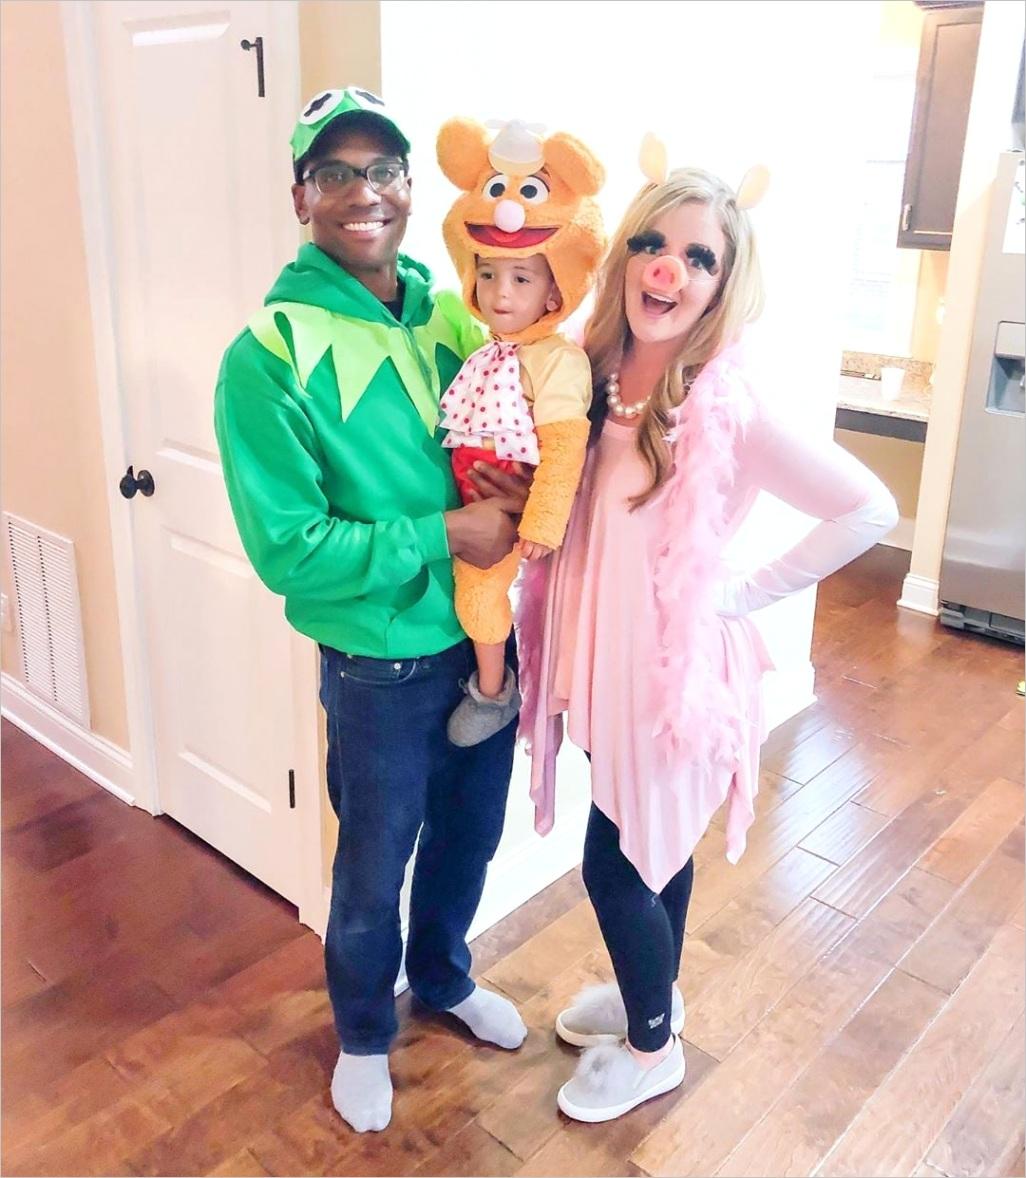 Family 3 Halloween Costumes